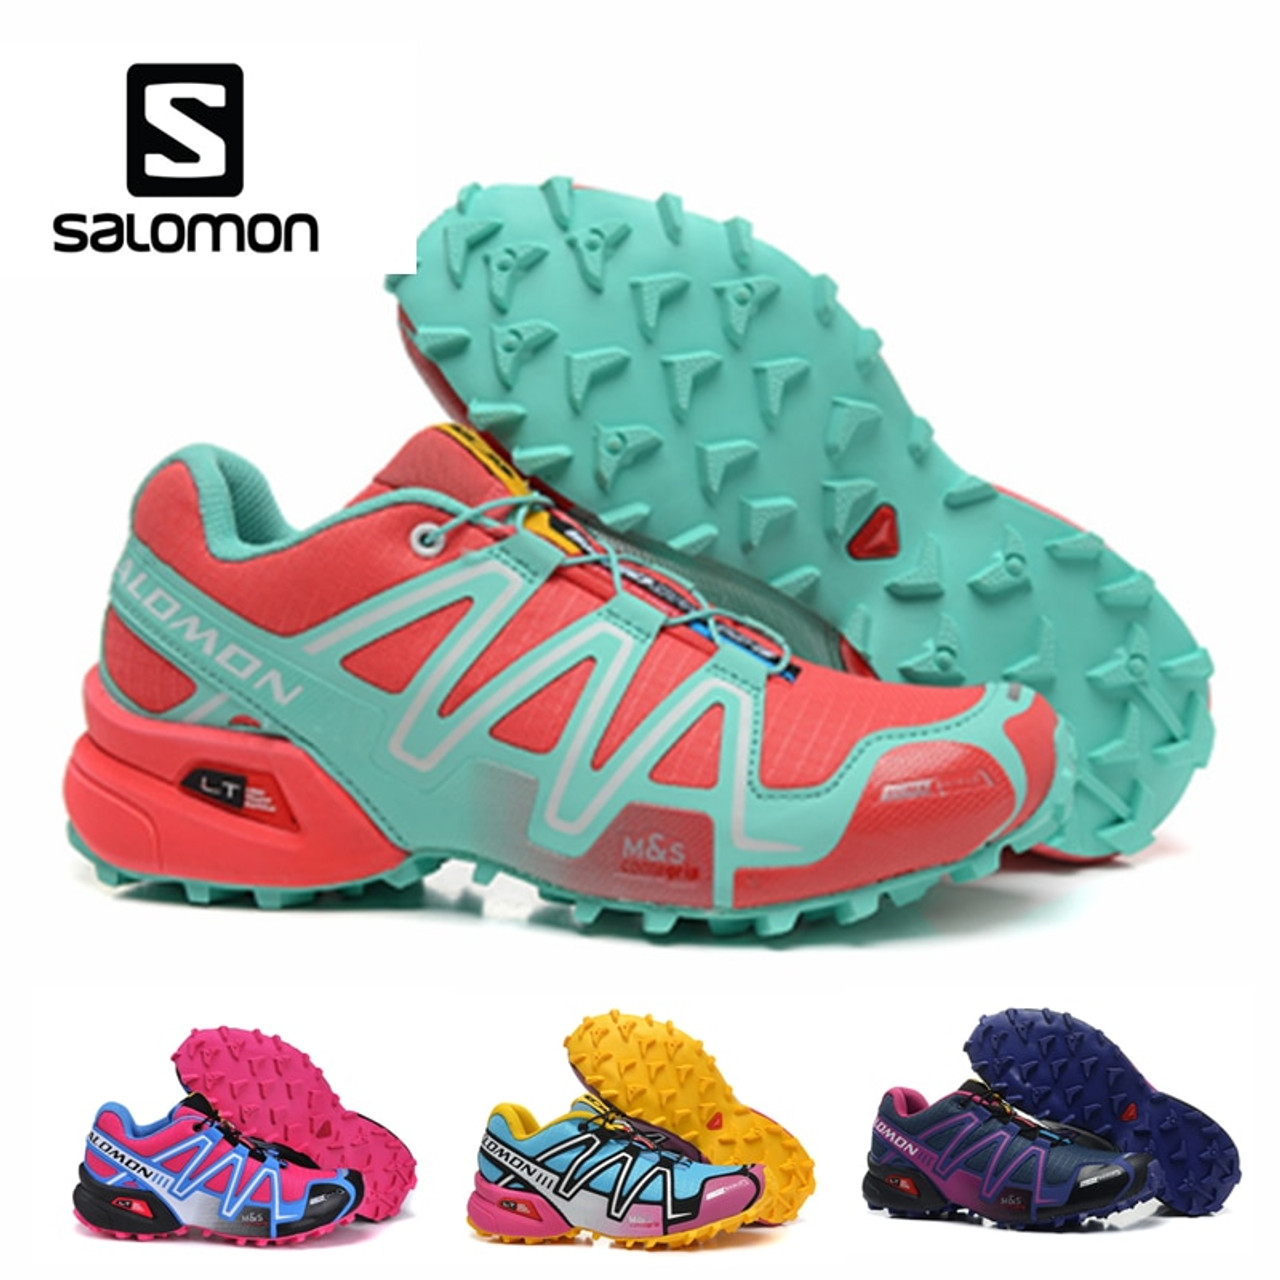 on sale fbd5c e1e00 Salomon Speedcross 3 CS Outdoor Sports Woman Shoes Breathable Athletics  Solomon Female Running Speed cross Fencing Shoes